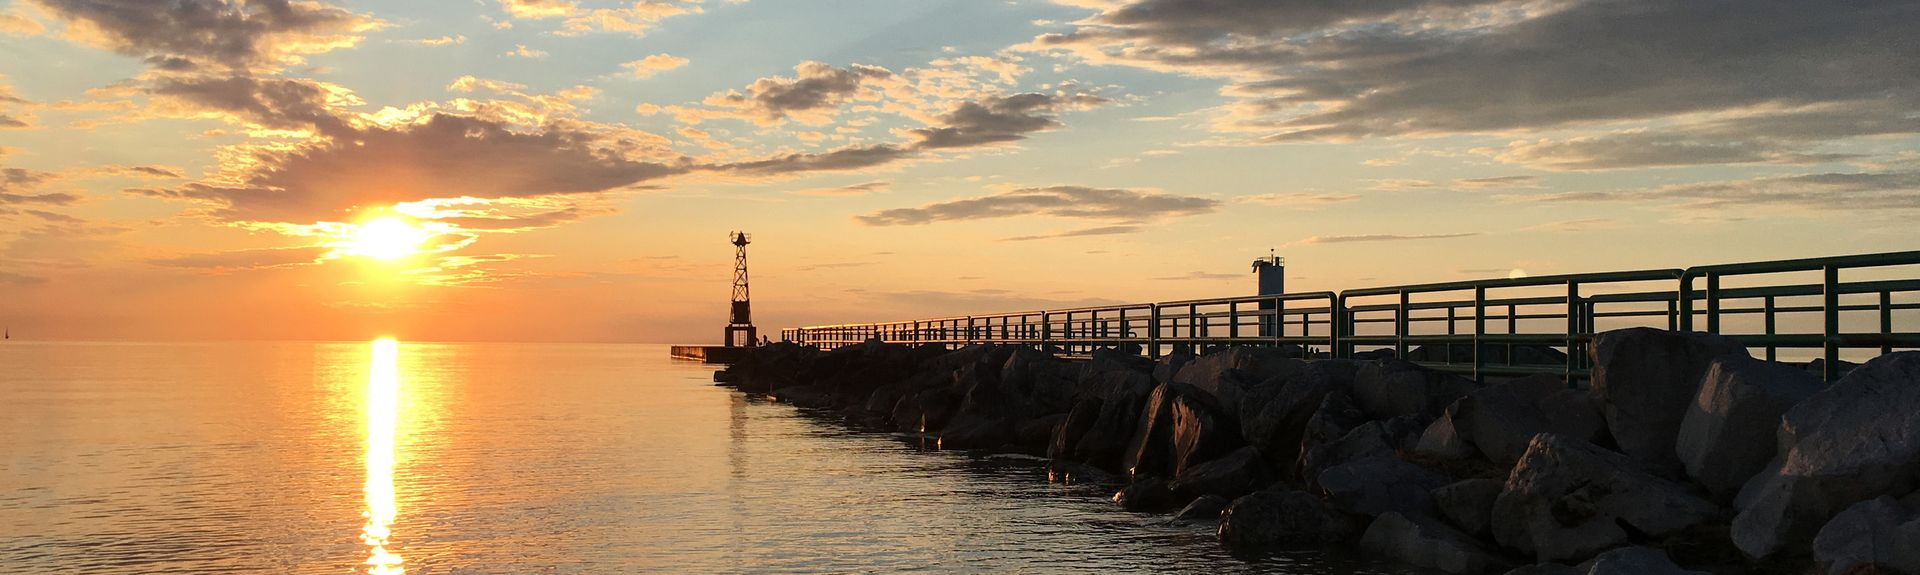 Ludington Waterfront Park, Ludington, MI, USA